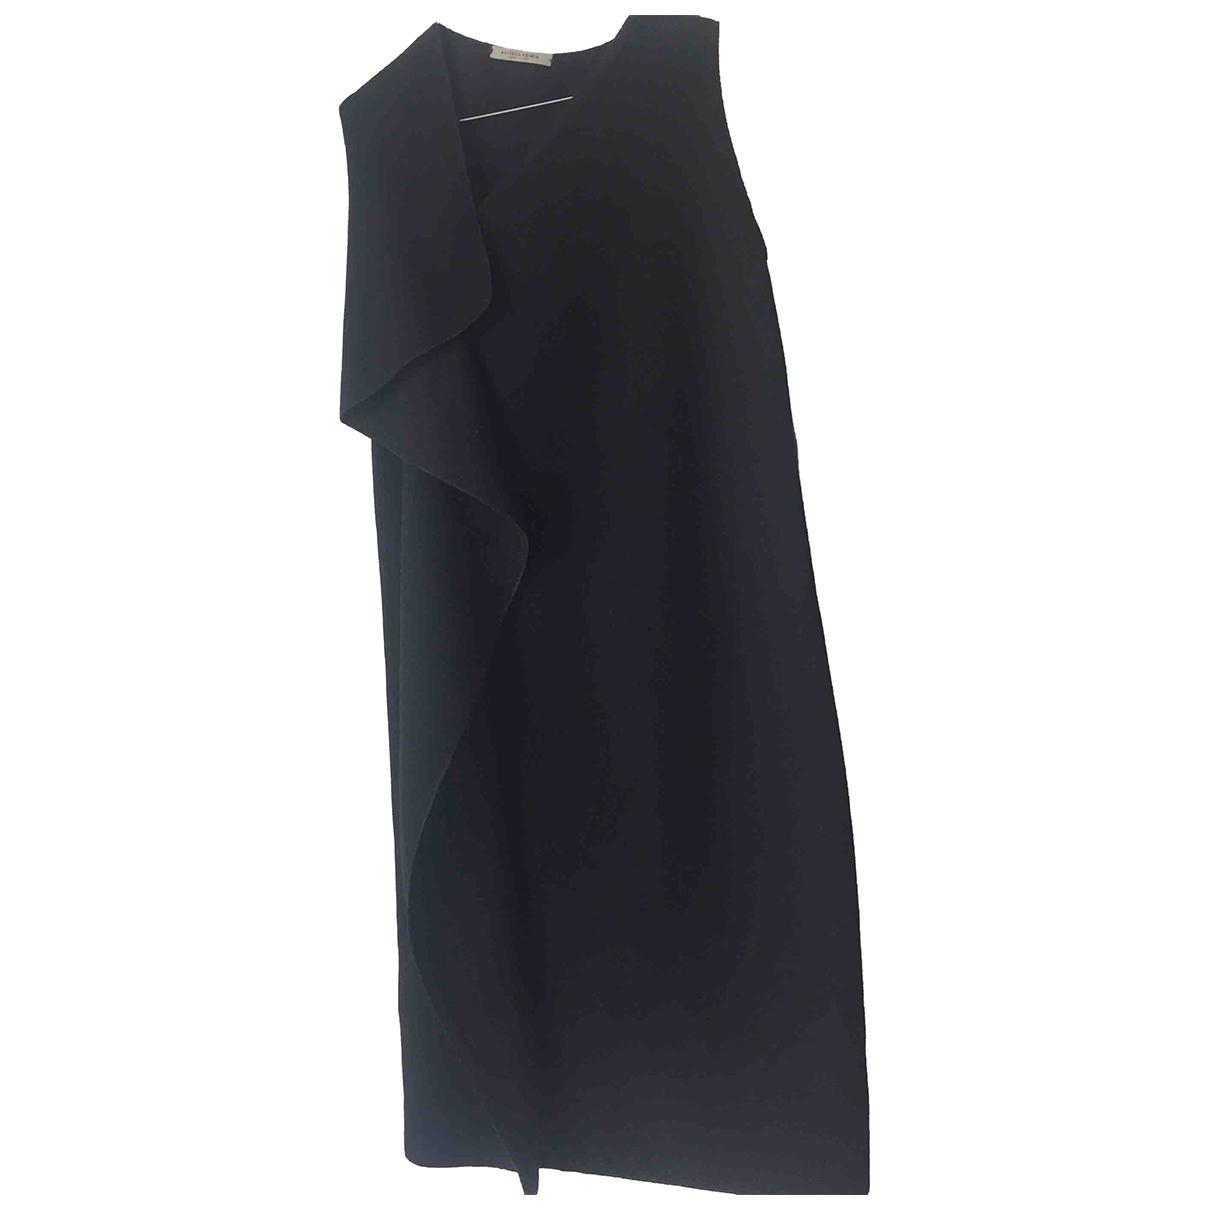 Bottega Veneta \N Black Wool dress for Women 38 IT